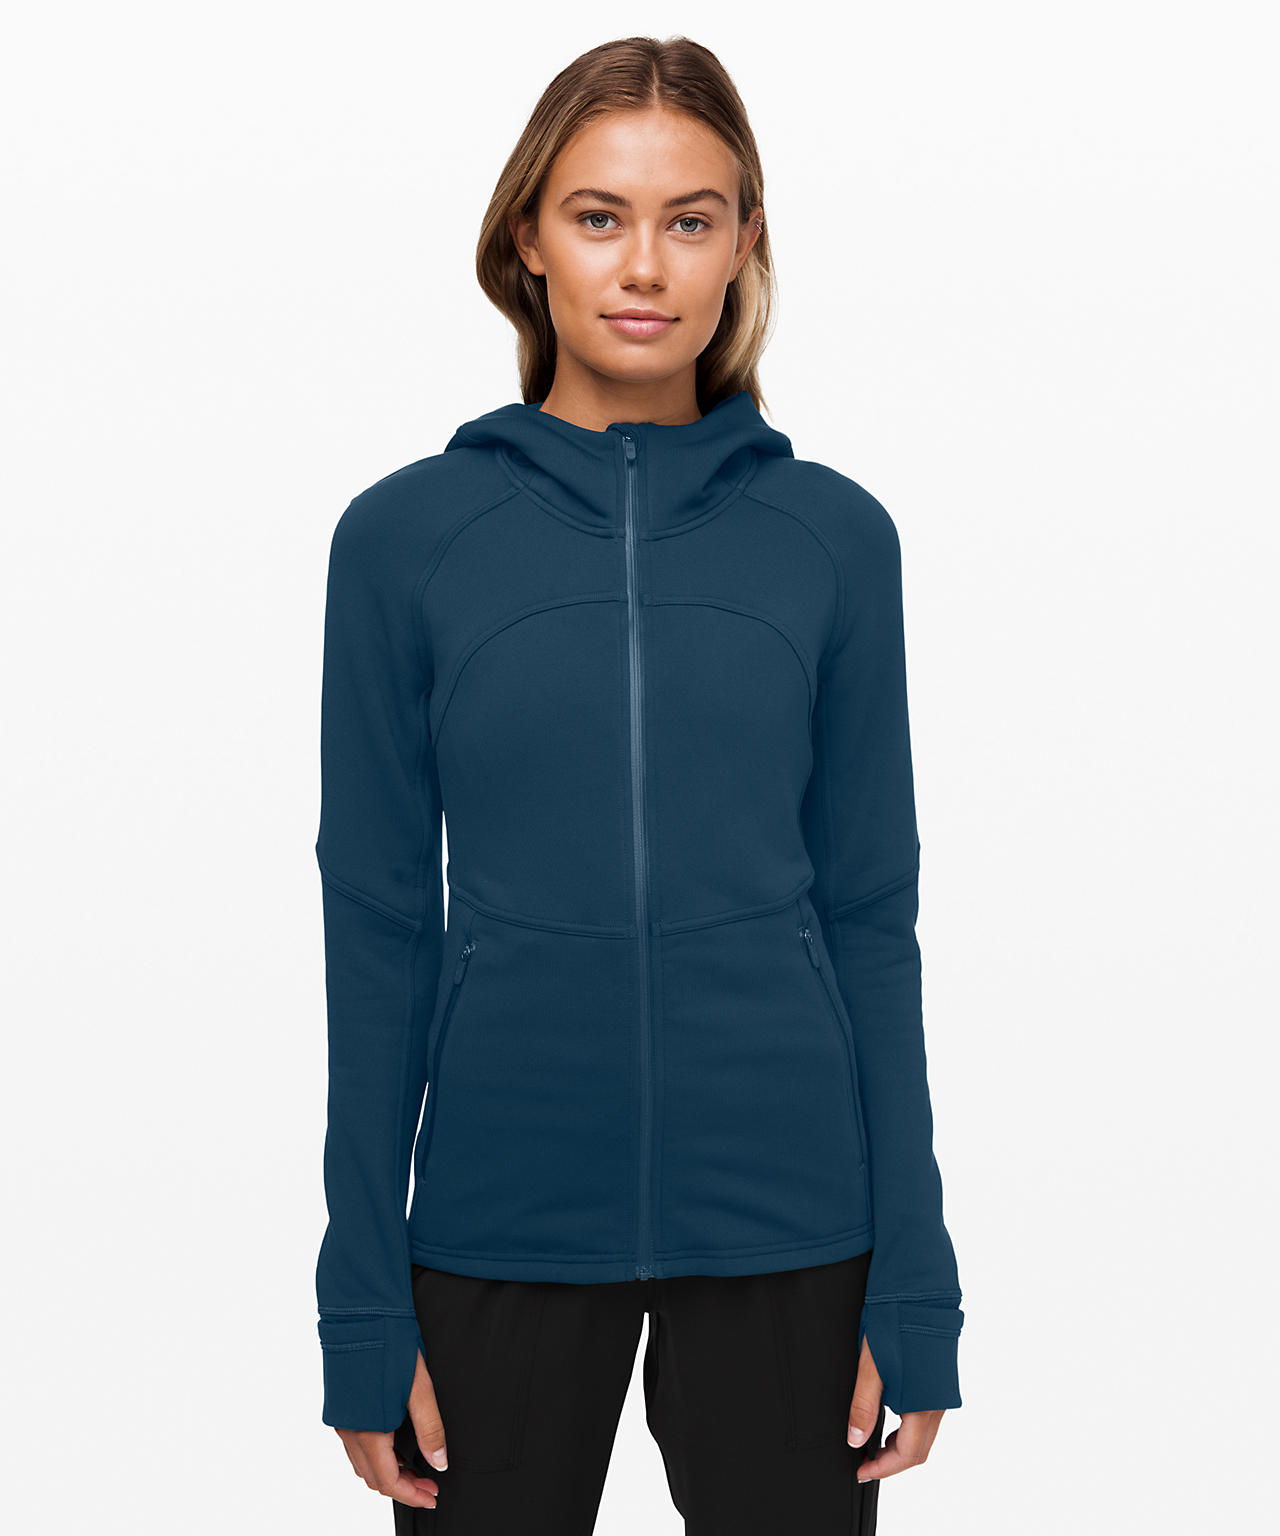 Fleece Flurry Jacket